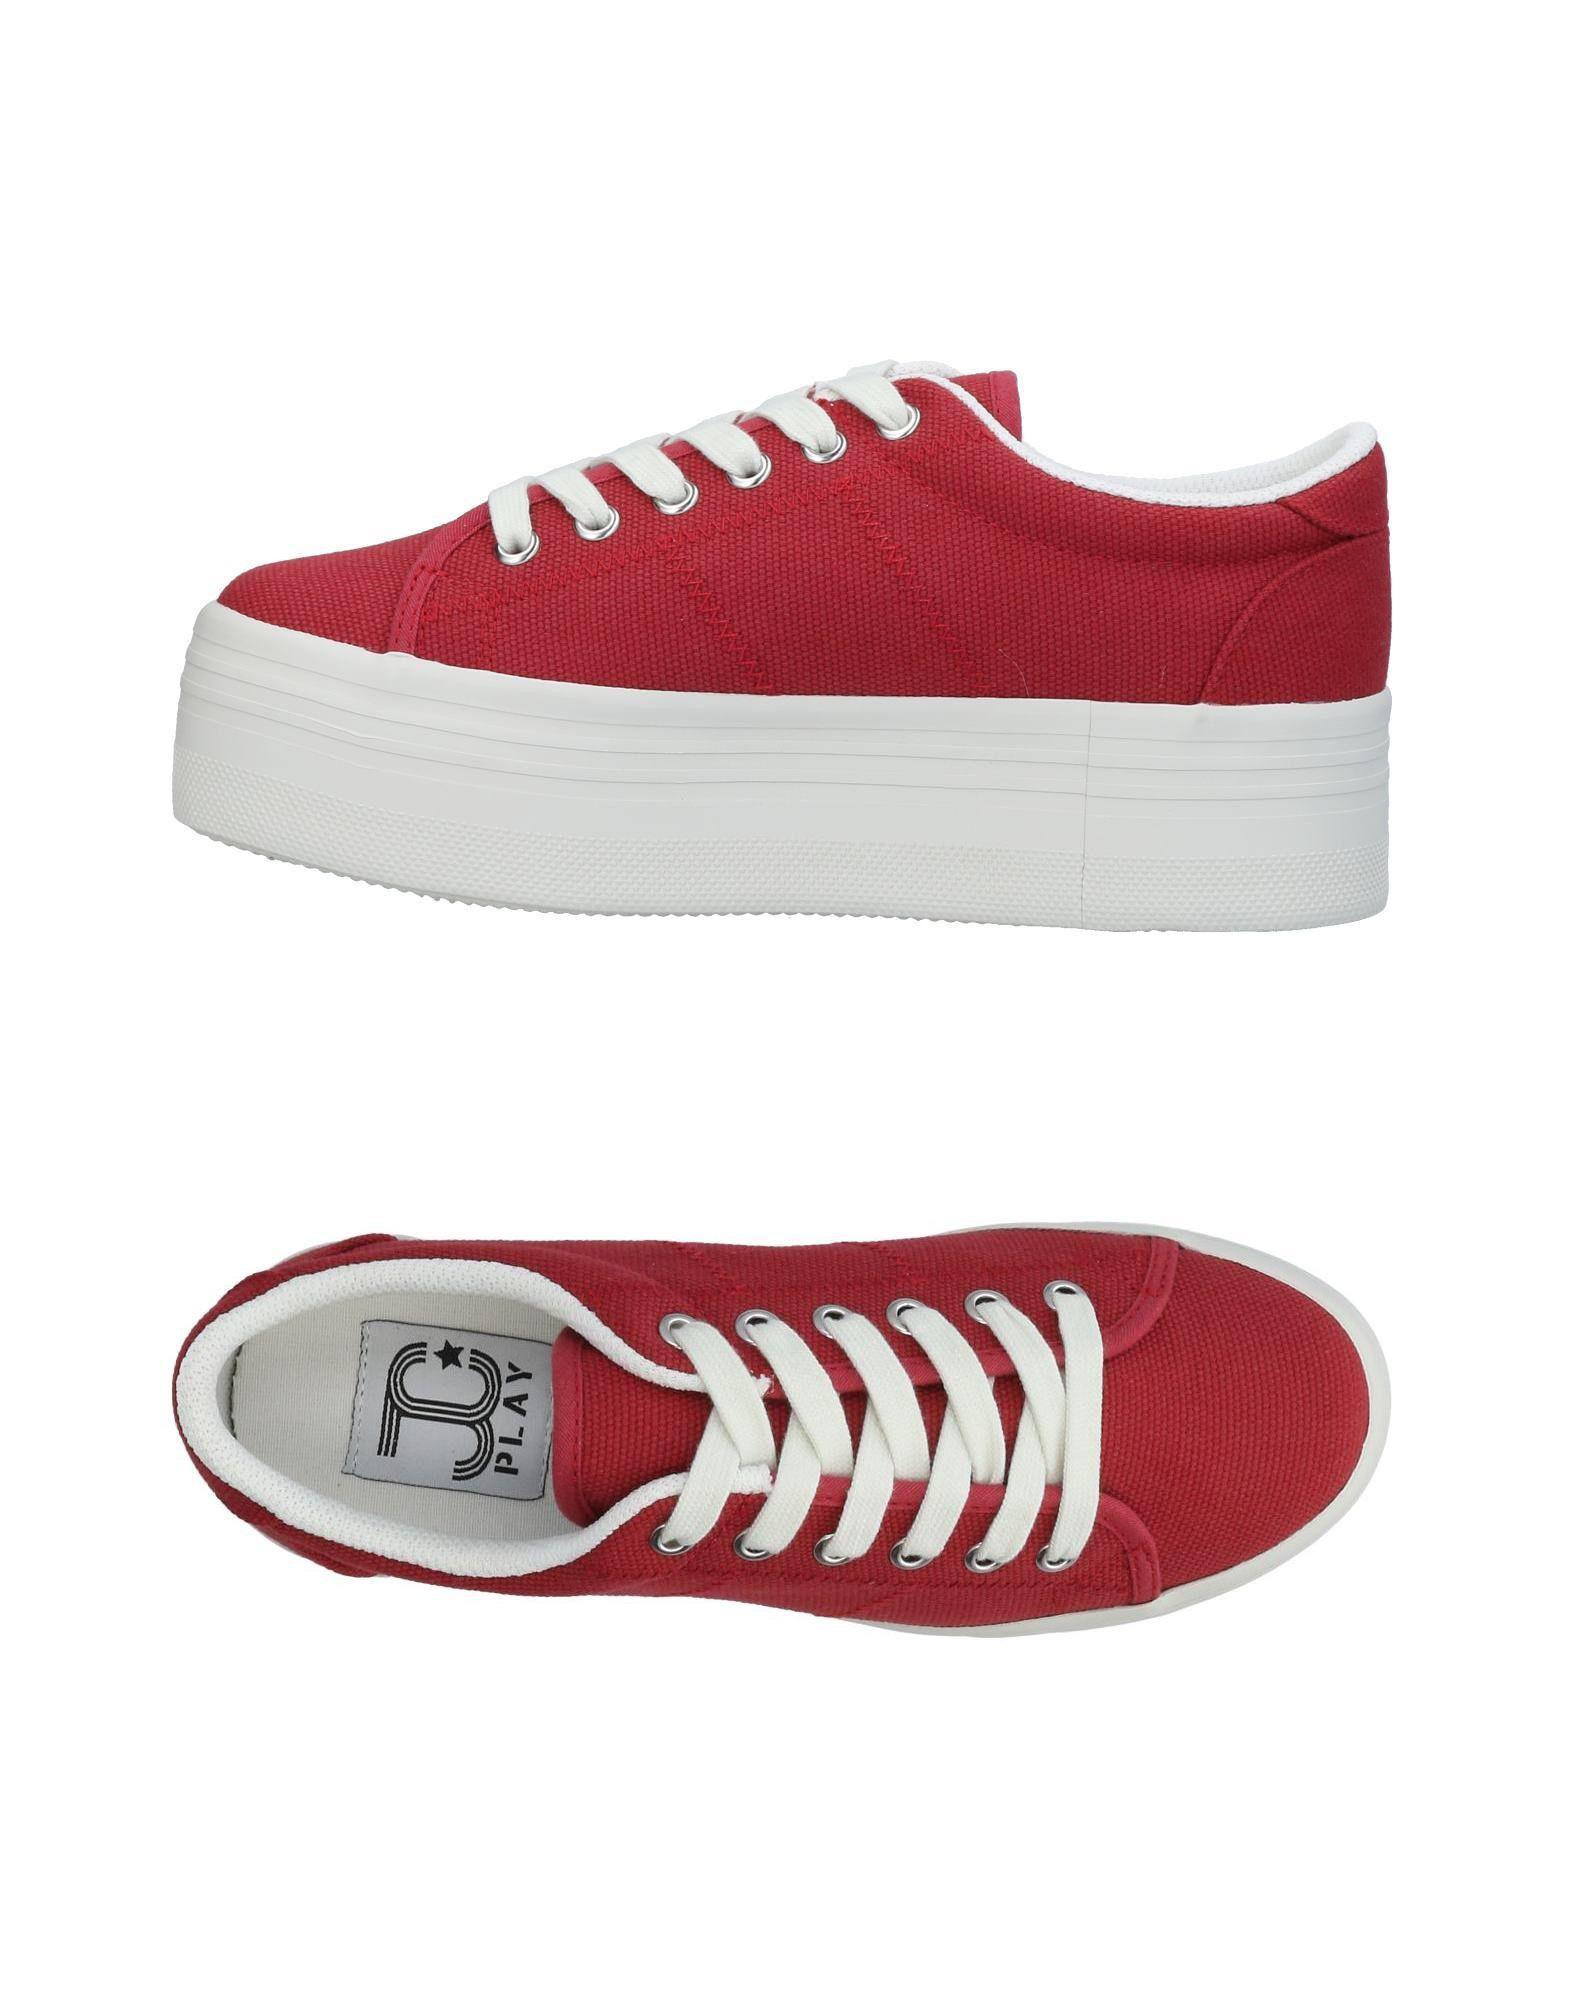 Chaussures - Bas-tops Et Baskets Campbell Jeffrey Gp6V67K5J0